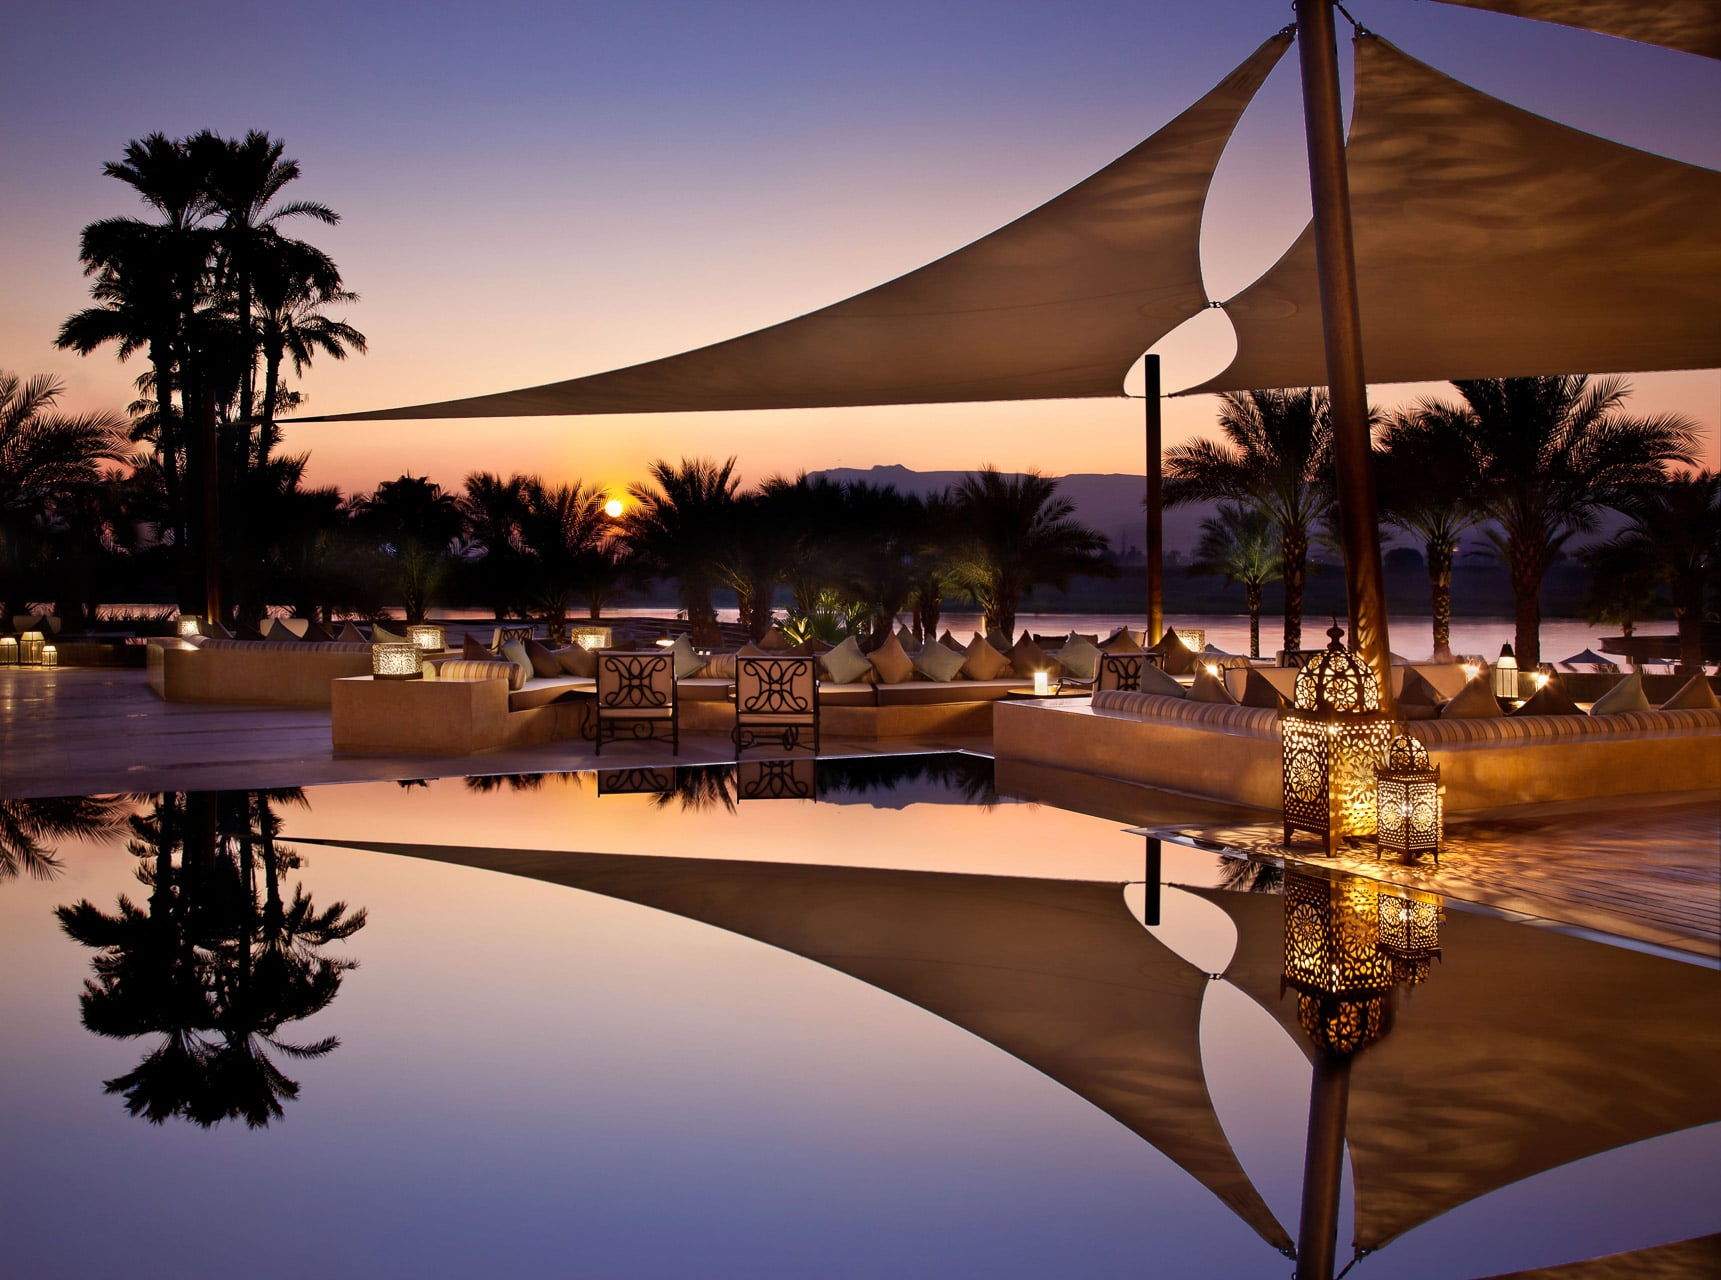 Hilton-Luxor-Resort-Aegypten-14